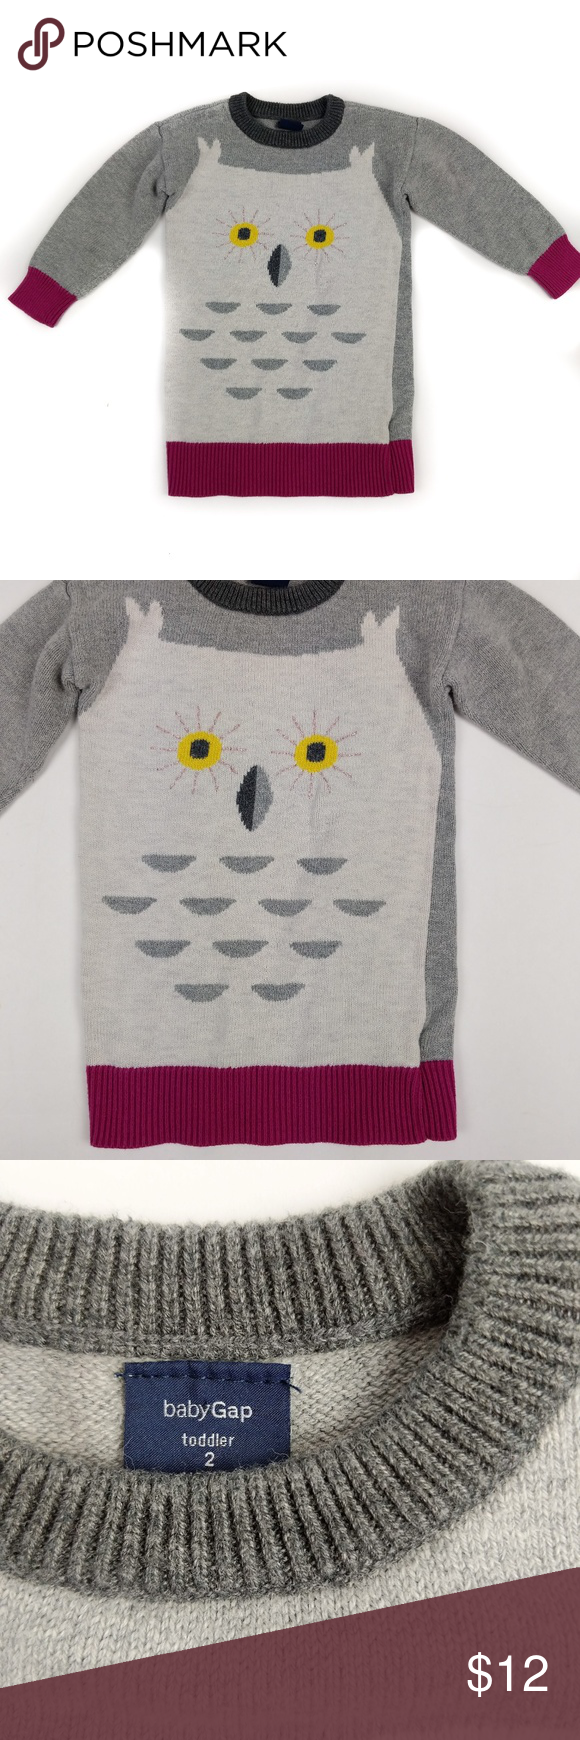 9166c30d1 Baby Gap Girls Long Sleeve Gray Owl Sweater 2 2T